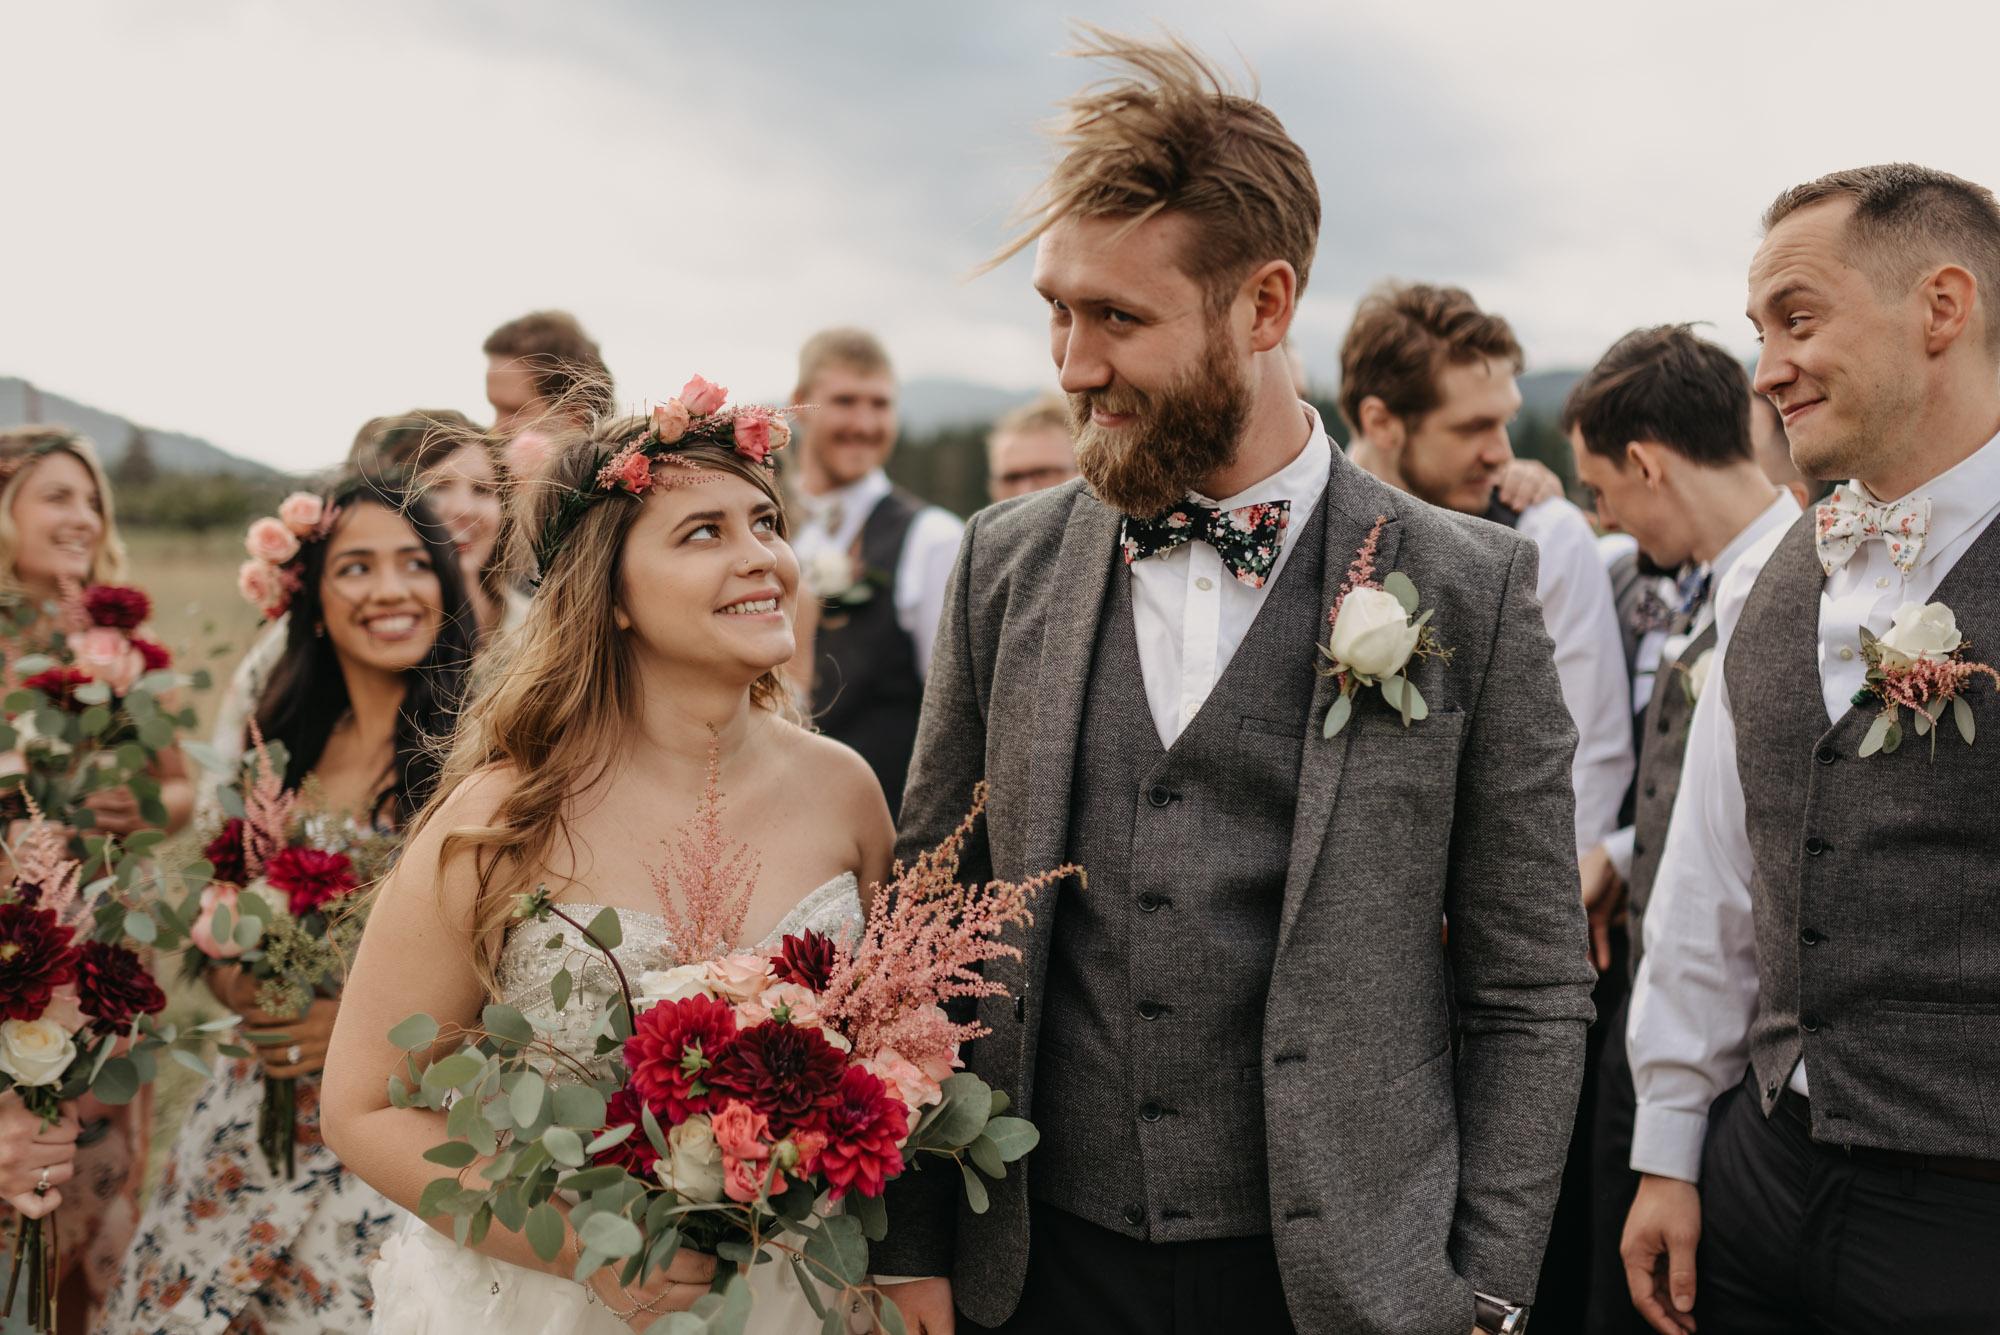 Bridal-Party-Free-People-Flower-Dresses-Washington-Wedding-8660.jpg